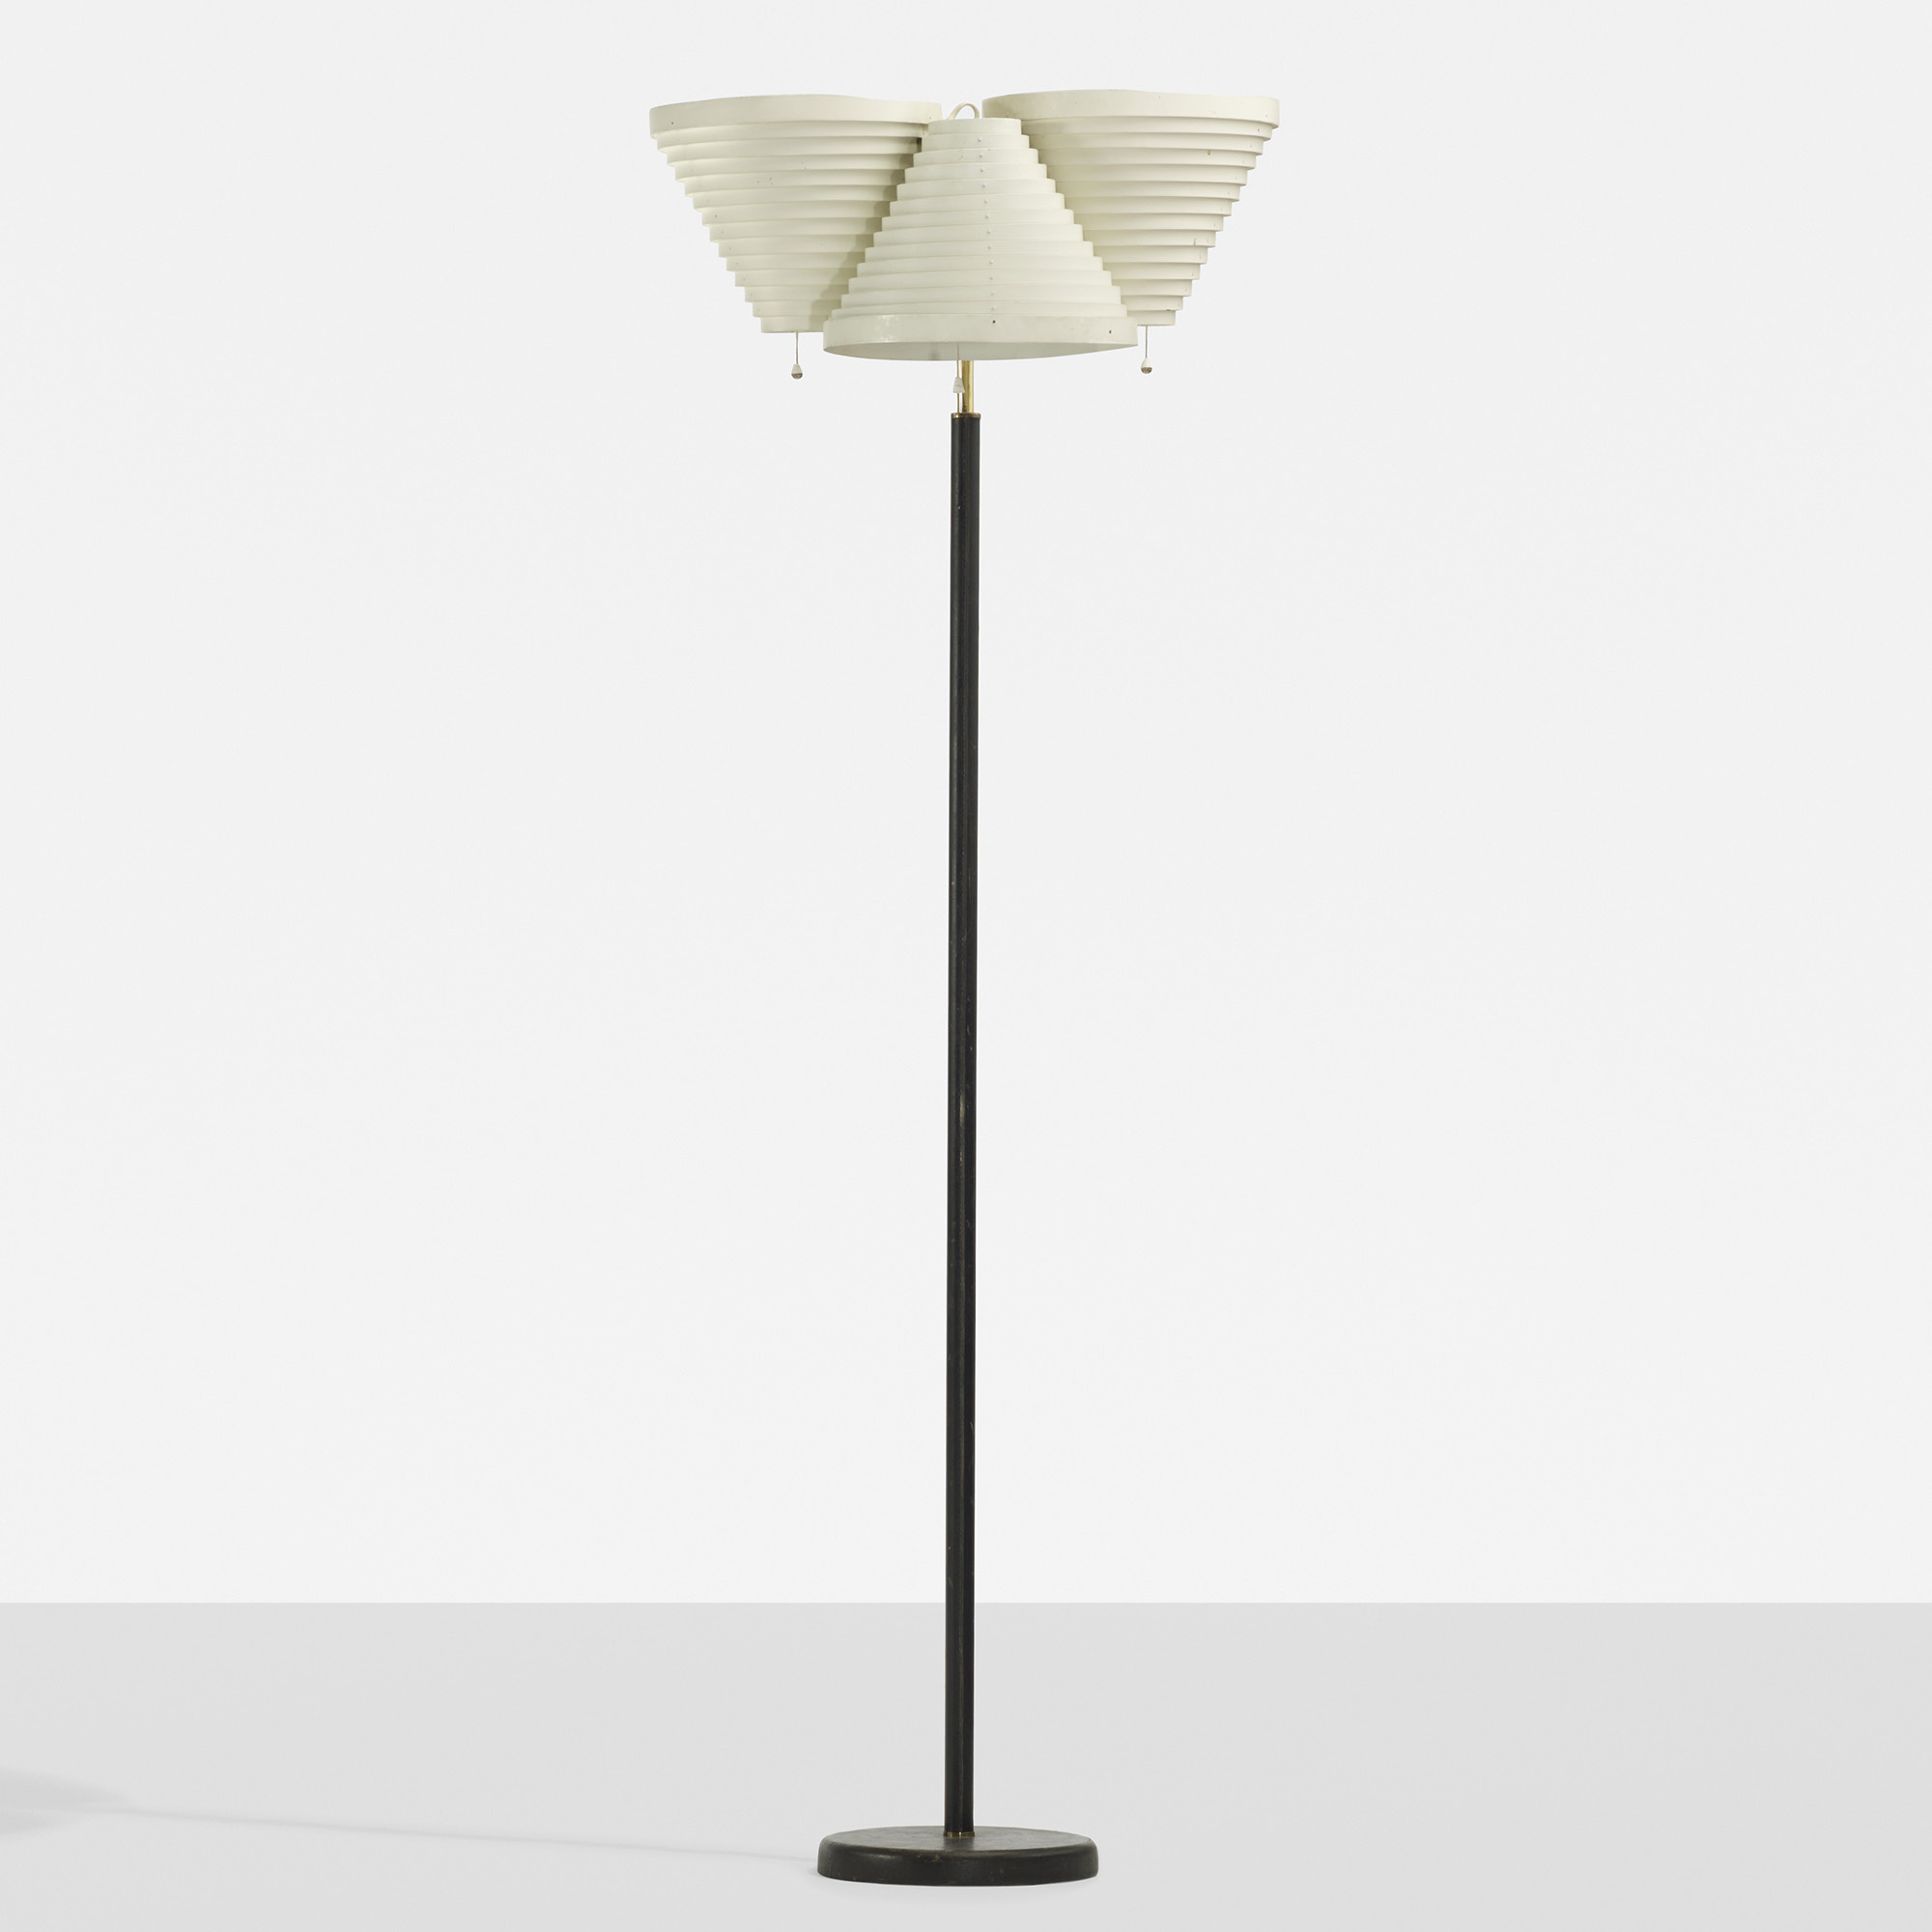 296 alvar aalto standard floor lamp model a809 scandinavian 296 alvar aalto standard floor lamp model a809 1 of 4 mozeypictures Images